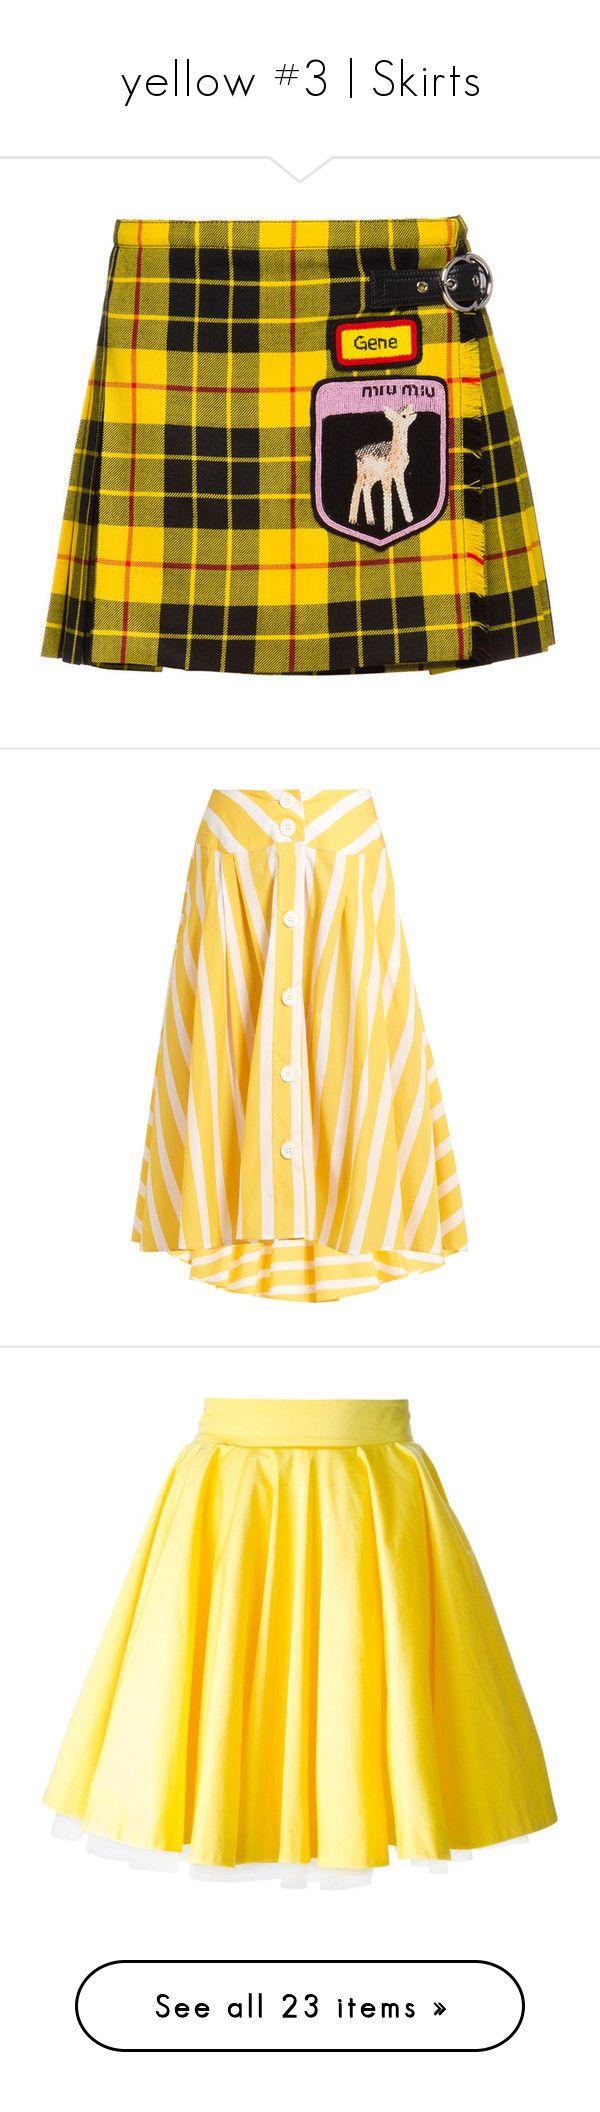 """yellow #3 | Skirts"" by karla-jhoana ❤ liked on Polyvore featuring skirts, yellow tartan skirt, embellished skirt, tartan skirt, woolen skirt, plaid pleated skirts, bottoms, yellow stripe, asymmetrical skirt and striped asymmetrical skirt"